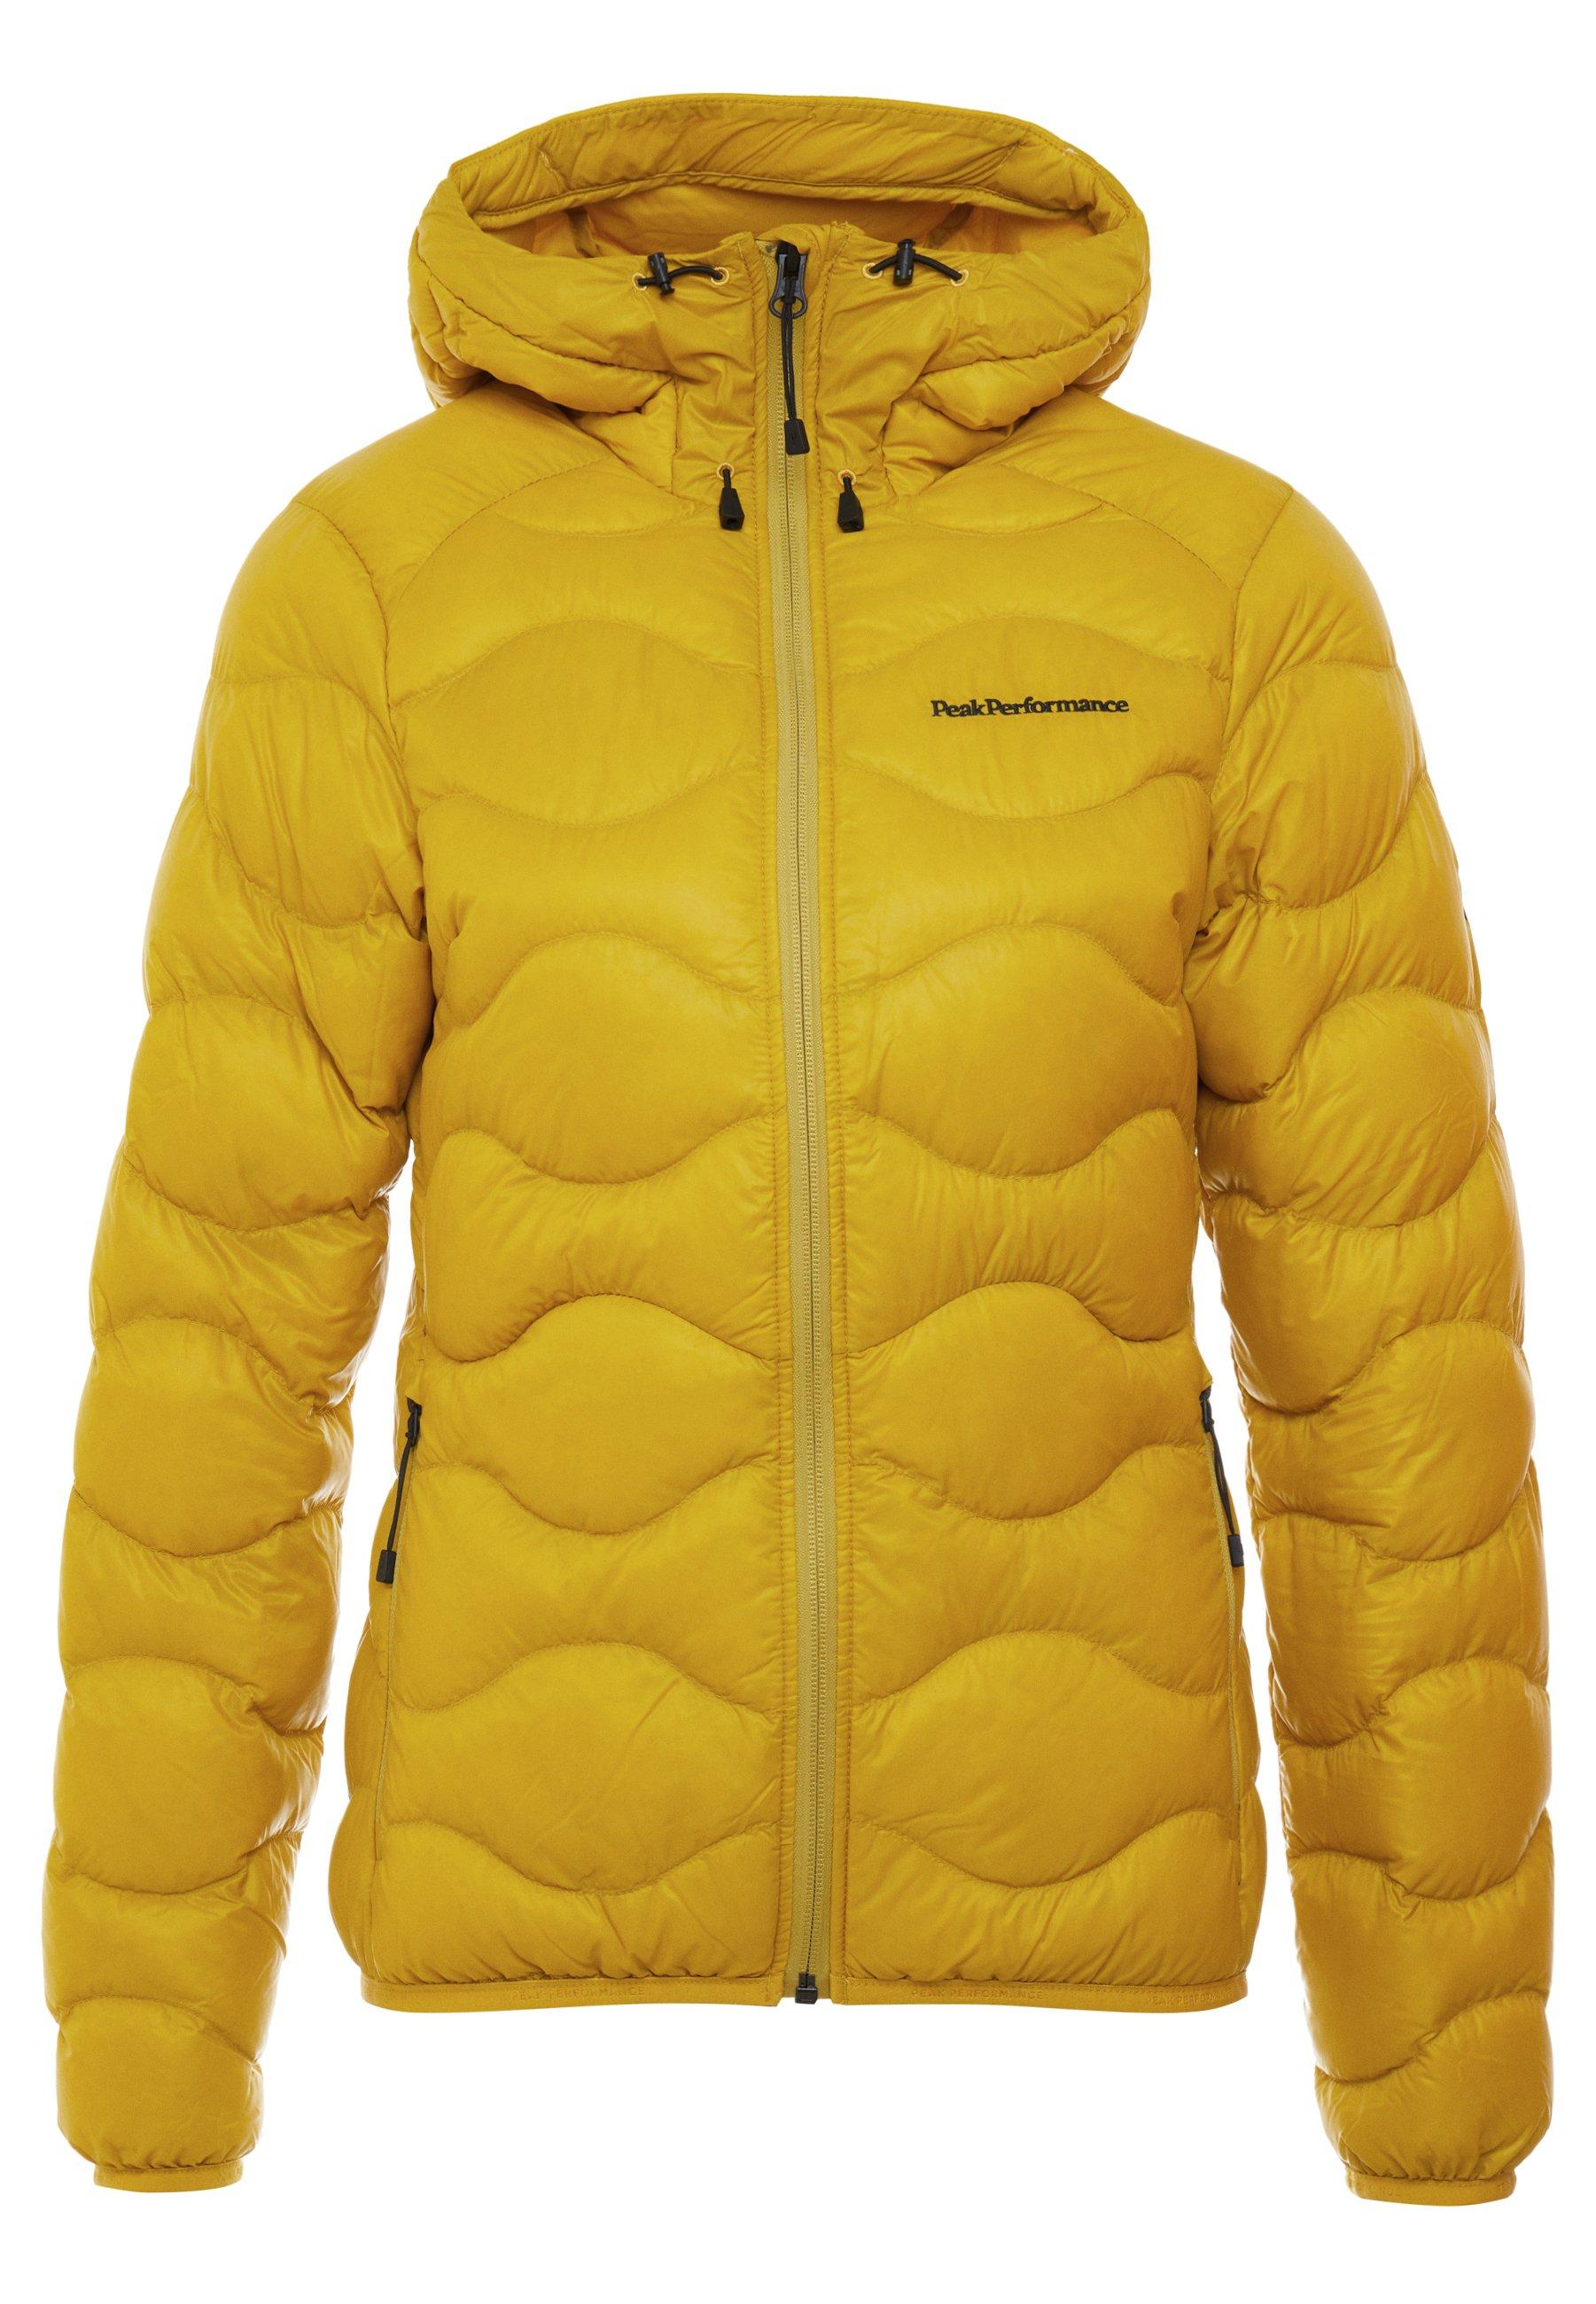 Peak Performance Helium Hood Jacket Yellow Flow